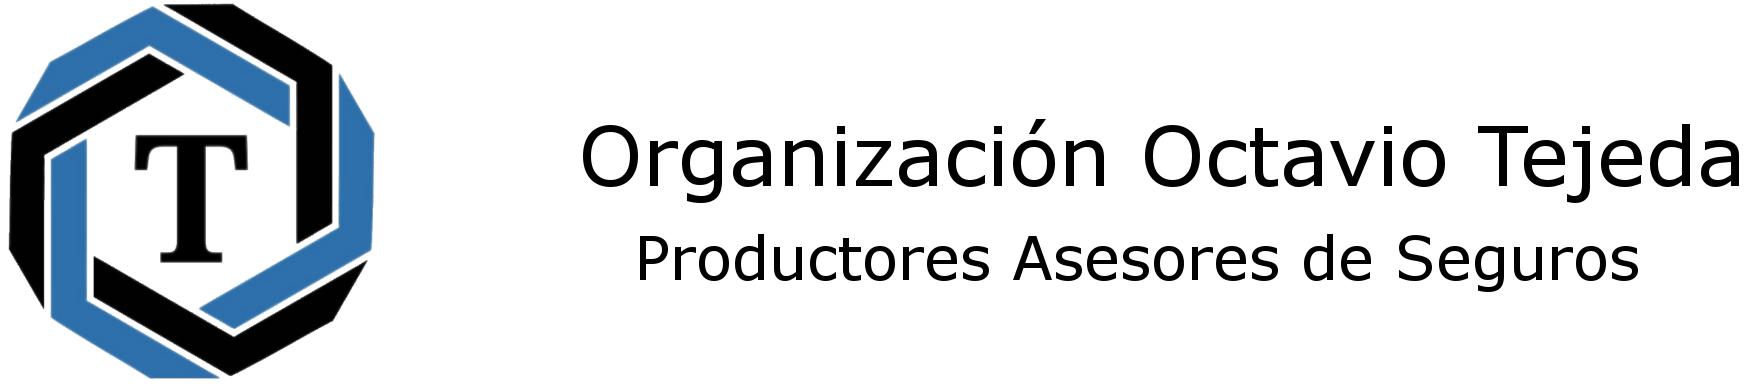 Organizacion Octavio Tejeda